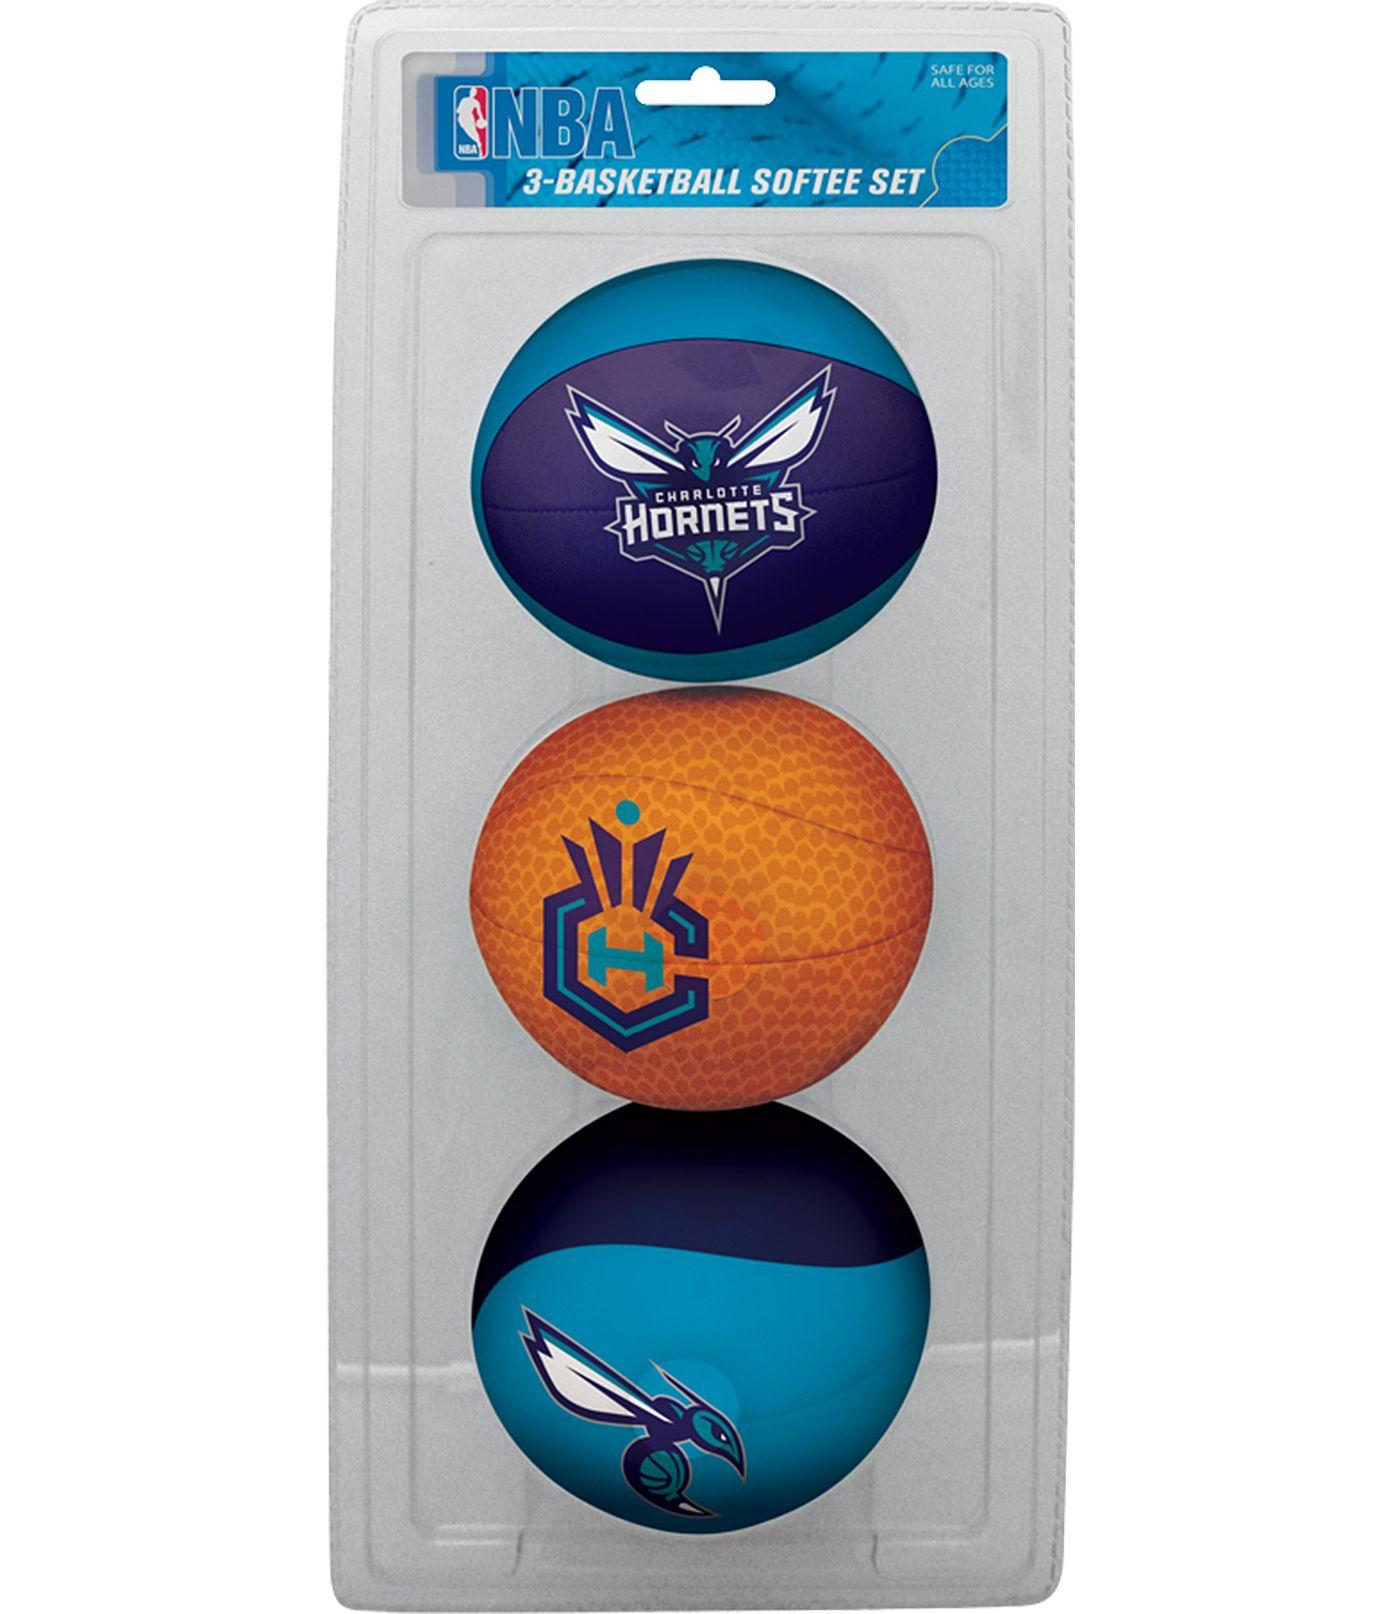 Rawlings Charlotte Hornets Softee Basketball 3-Ball Set